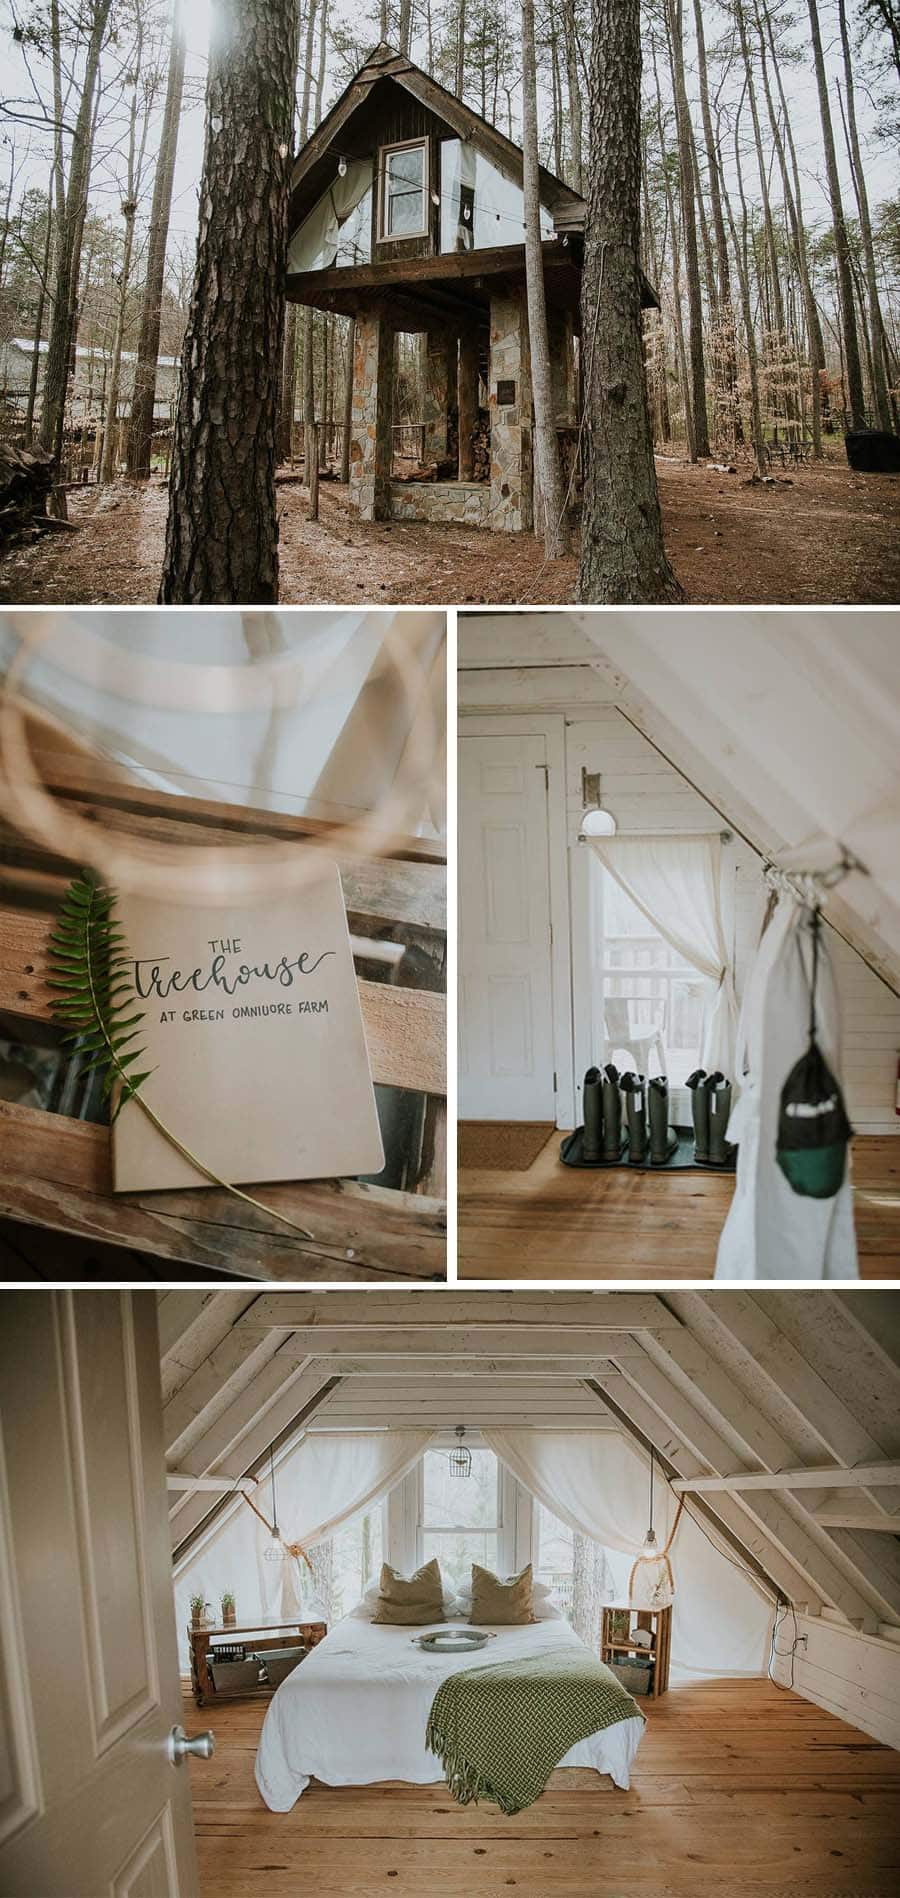 North Carolina romantic treehouse Airbnb